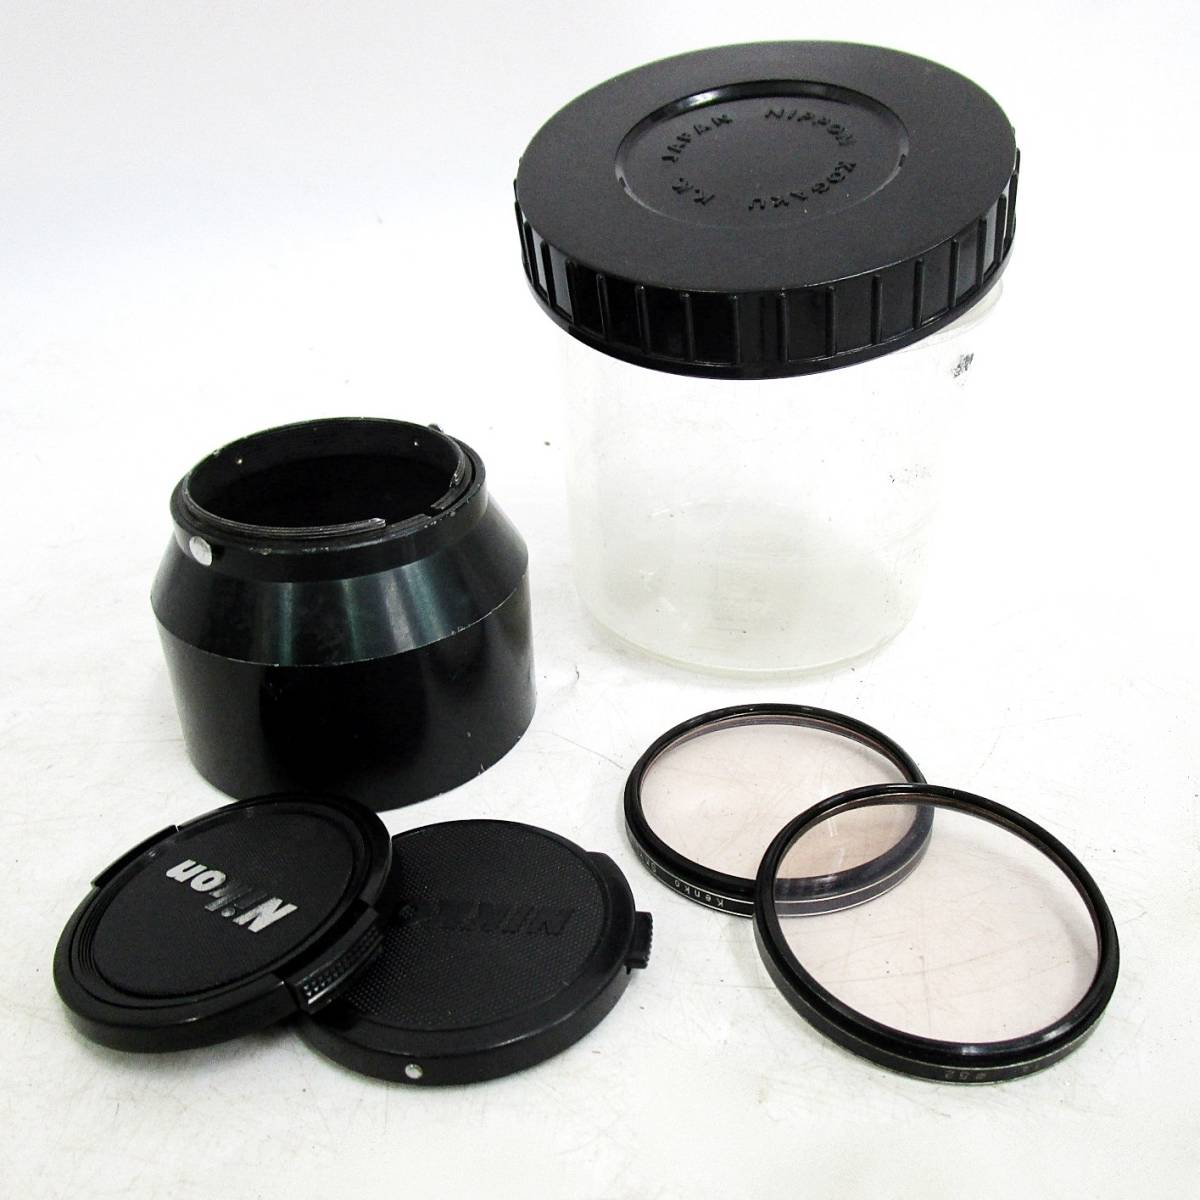 20 110-76348-28 Nikon ニコン F アイレベル 一眼レフカメラ レンズ NIKKOR-S Auto 1:2.8 f=35mm / NIKKOR-P Auto 1:2.5 f=10.5cm 長110_画像10